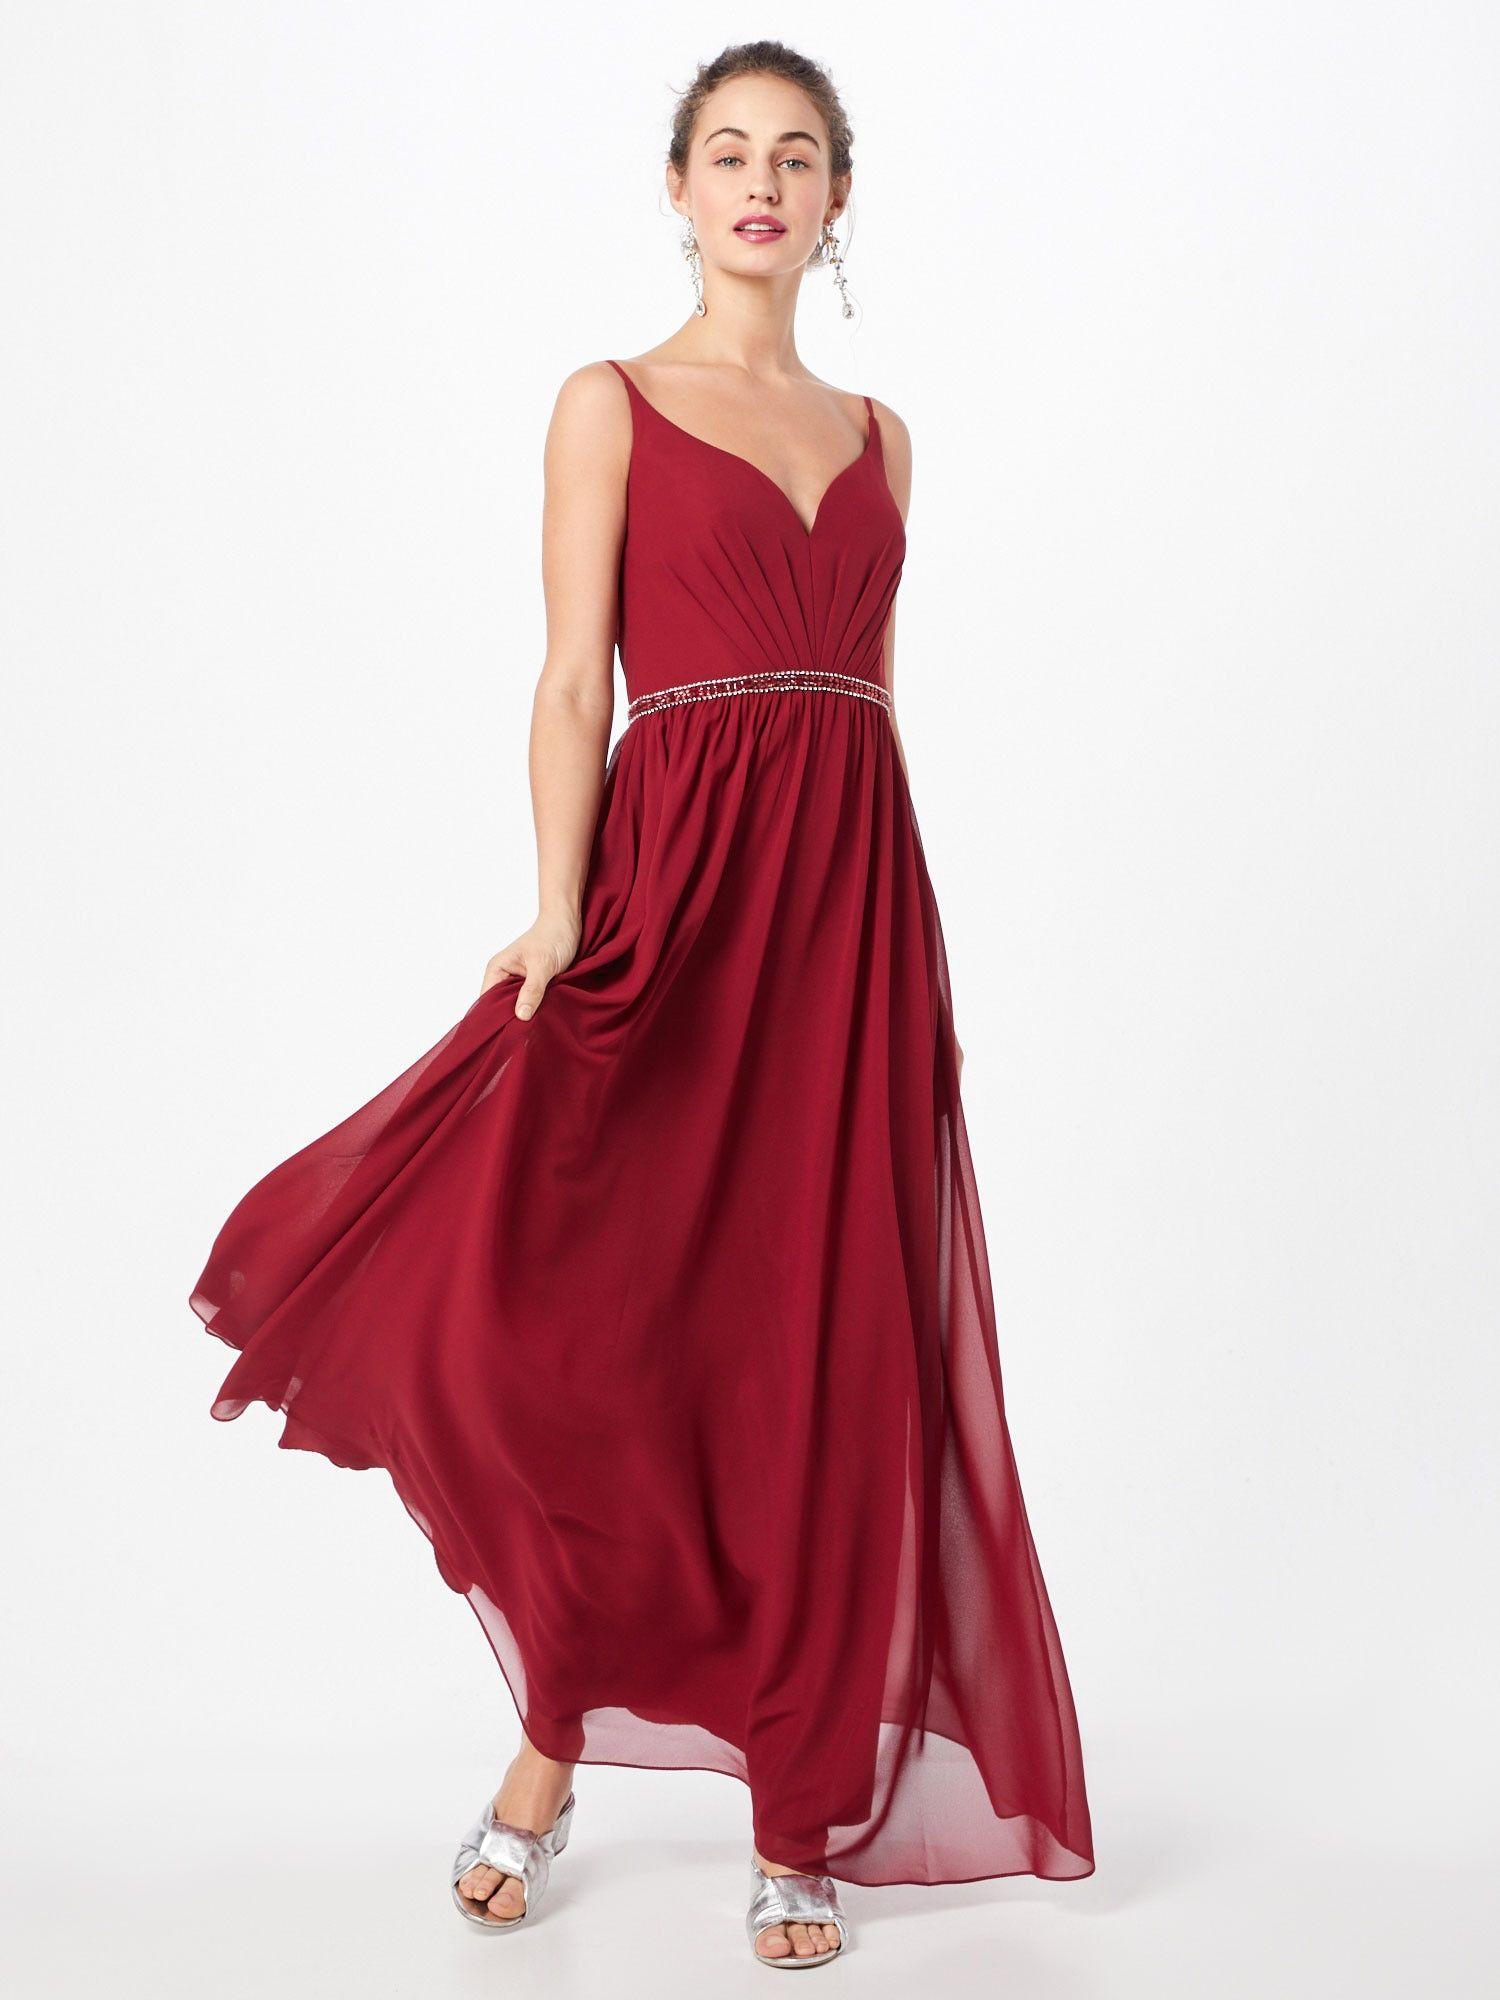 Mascara Kleid Damen, Bordeaux, Größe 18  Langes abendkleid